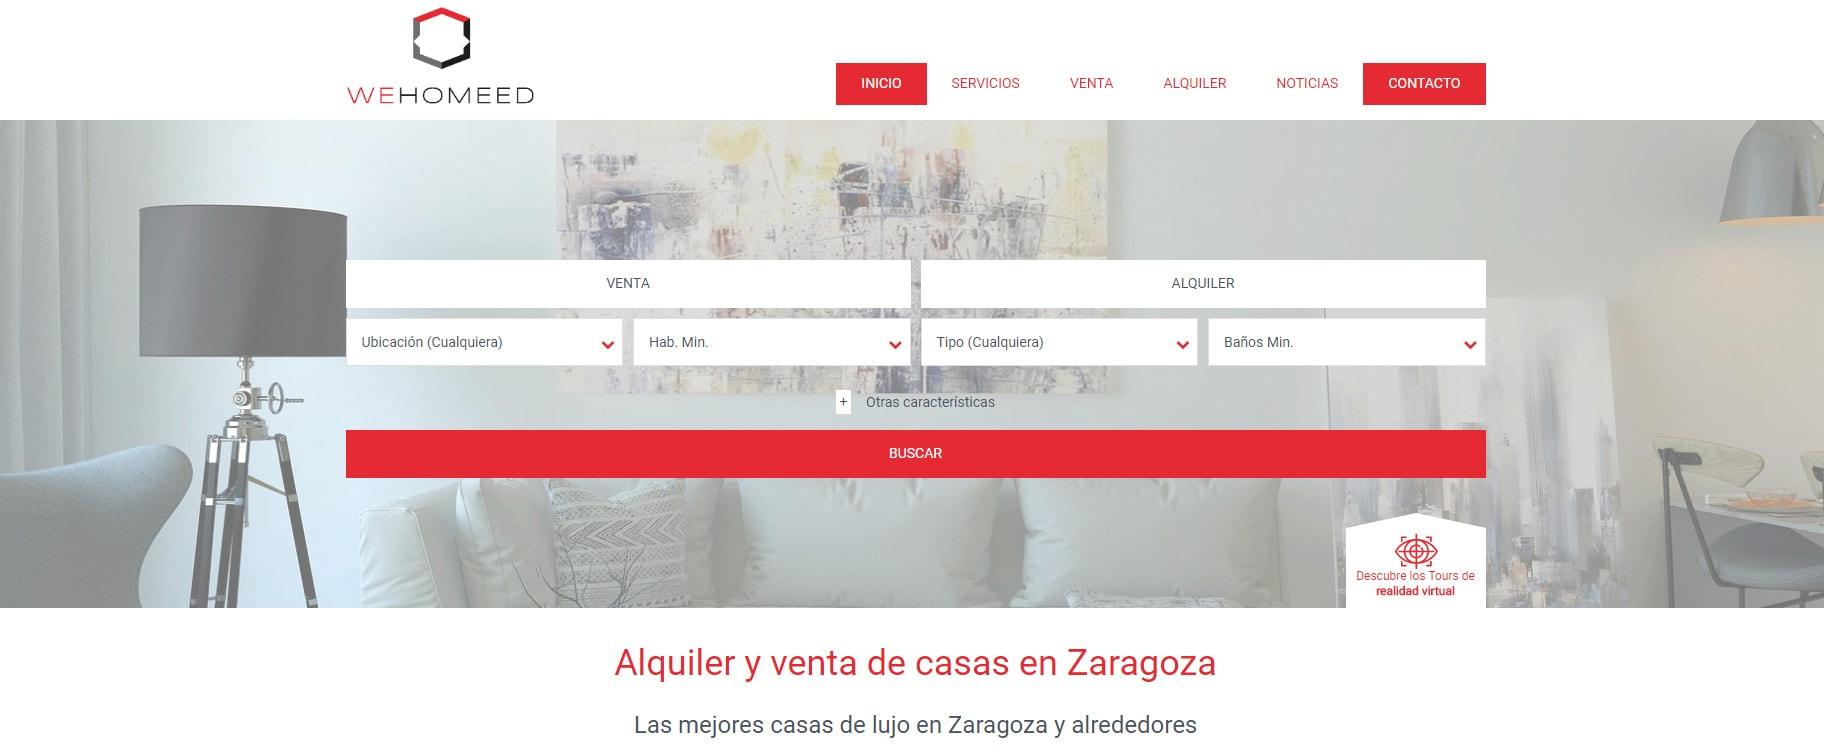 Descubriendo Zaragoza: Wehomeed